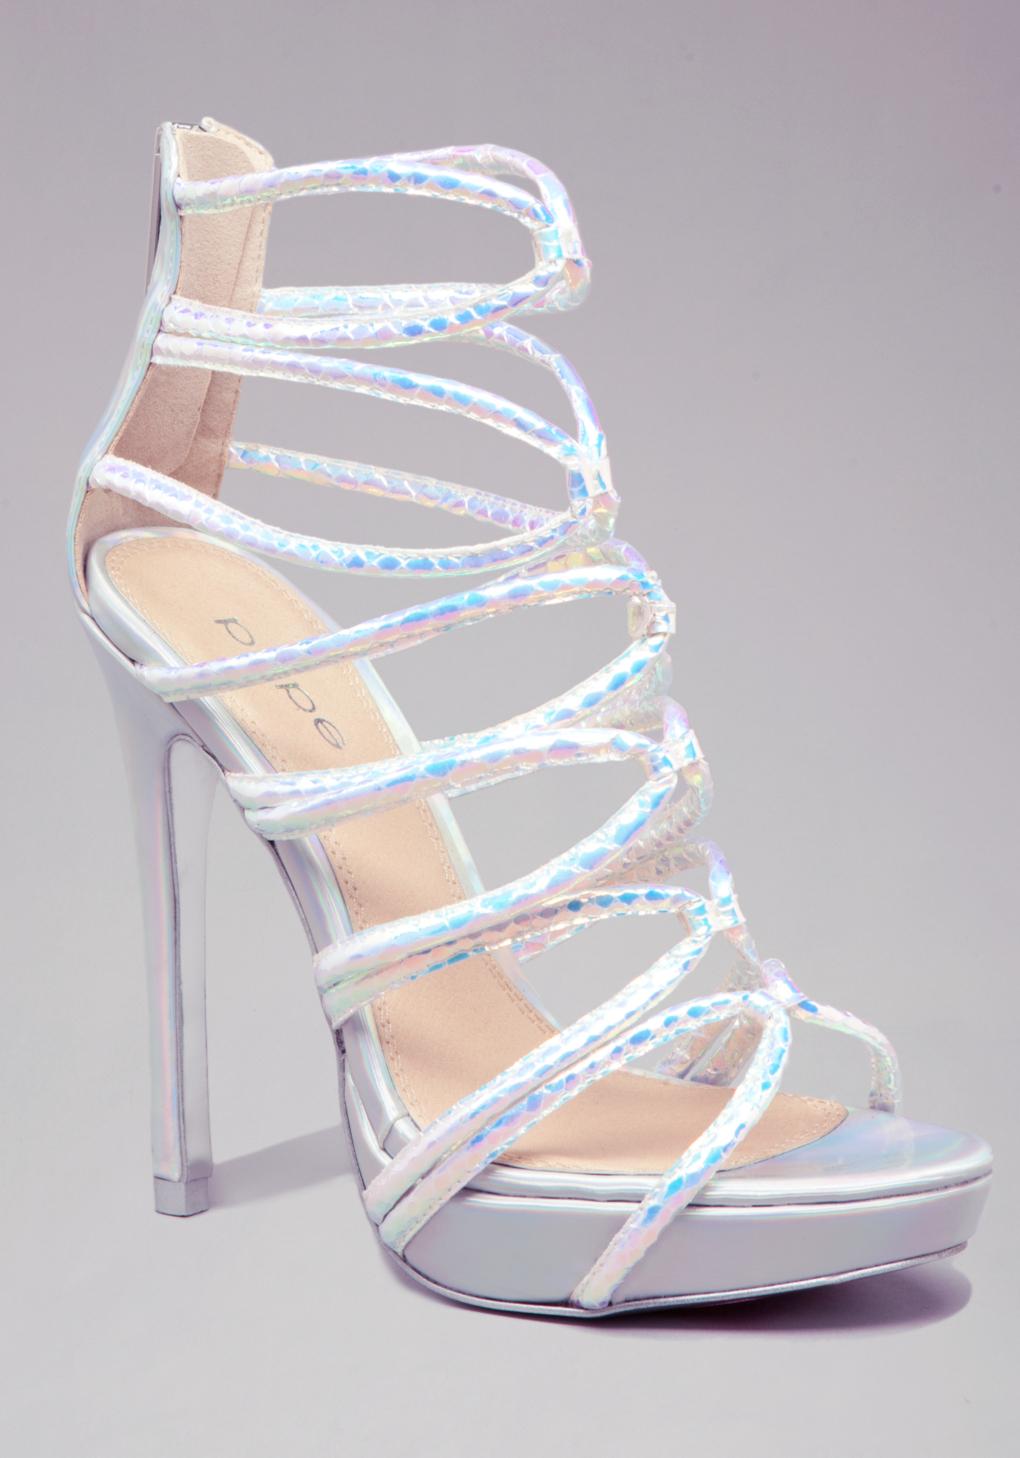 2ec76f80415 Lyst - Bebe Hologram Strappy Sandal in Metallic